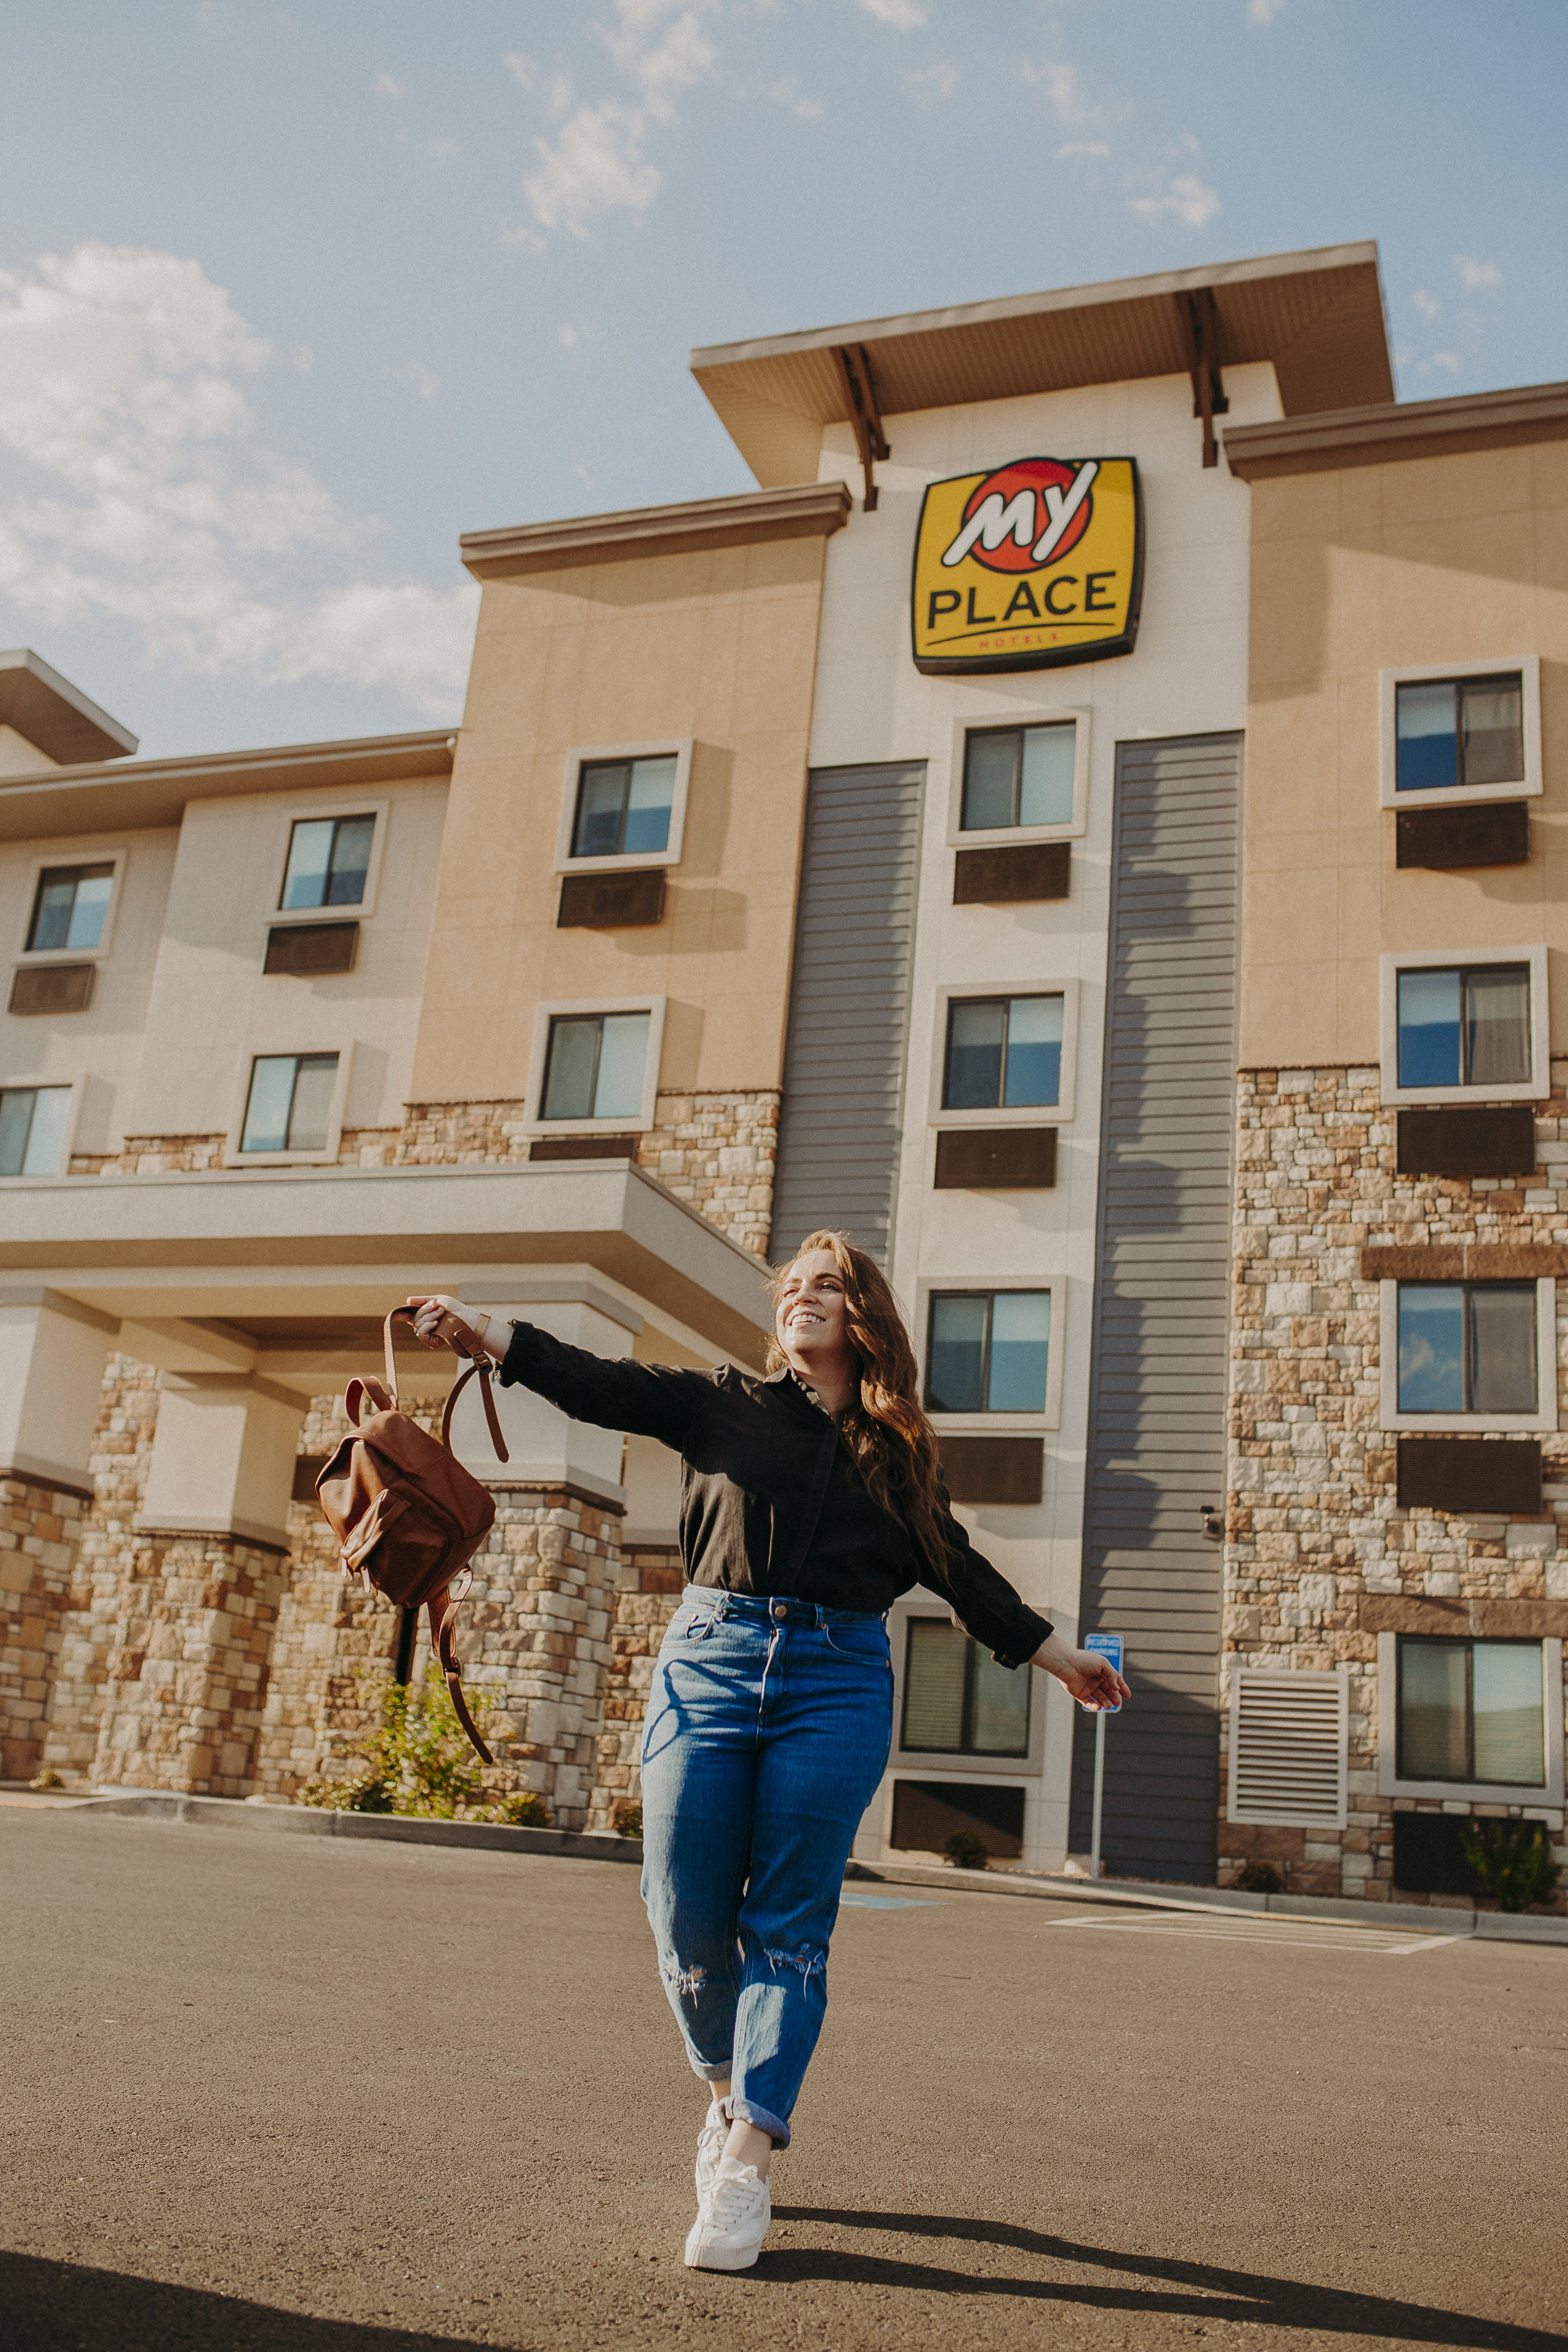 Best Budget Family Friendly Hotel St George Utah-9.jpg